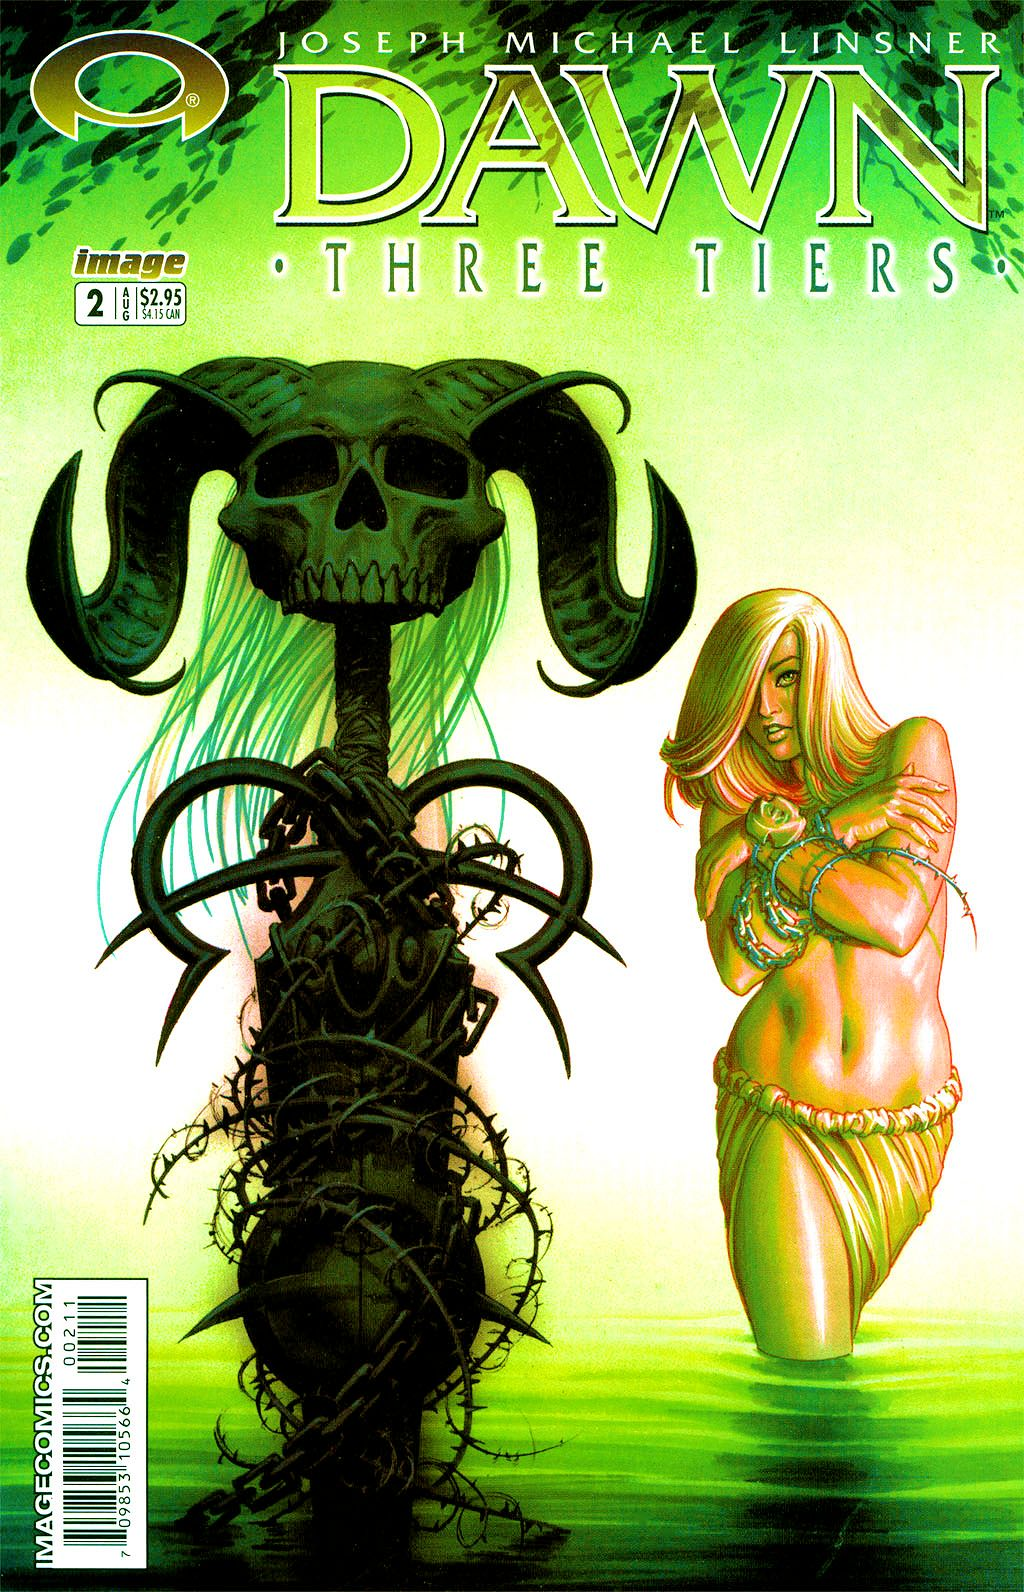 Read online Dawn: Three Tiers comic -  Issue #2 - 2